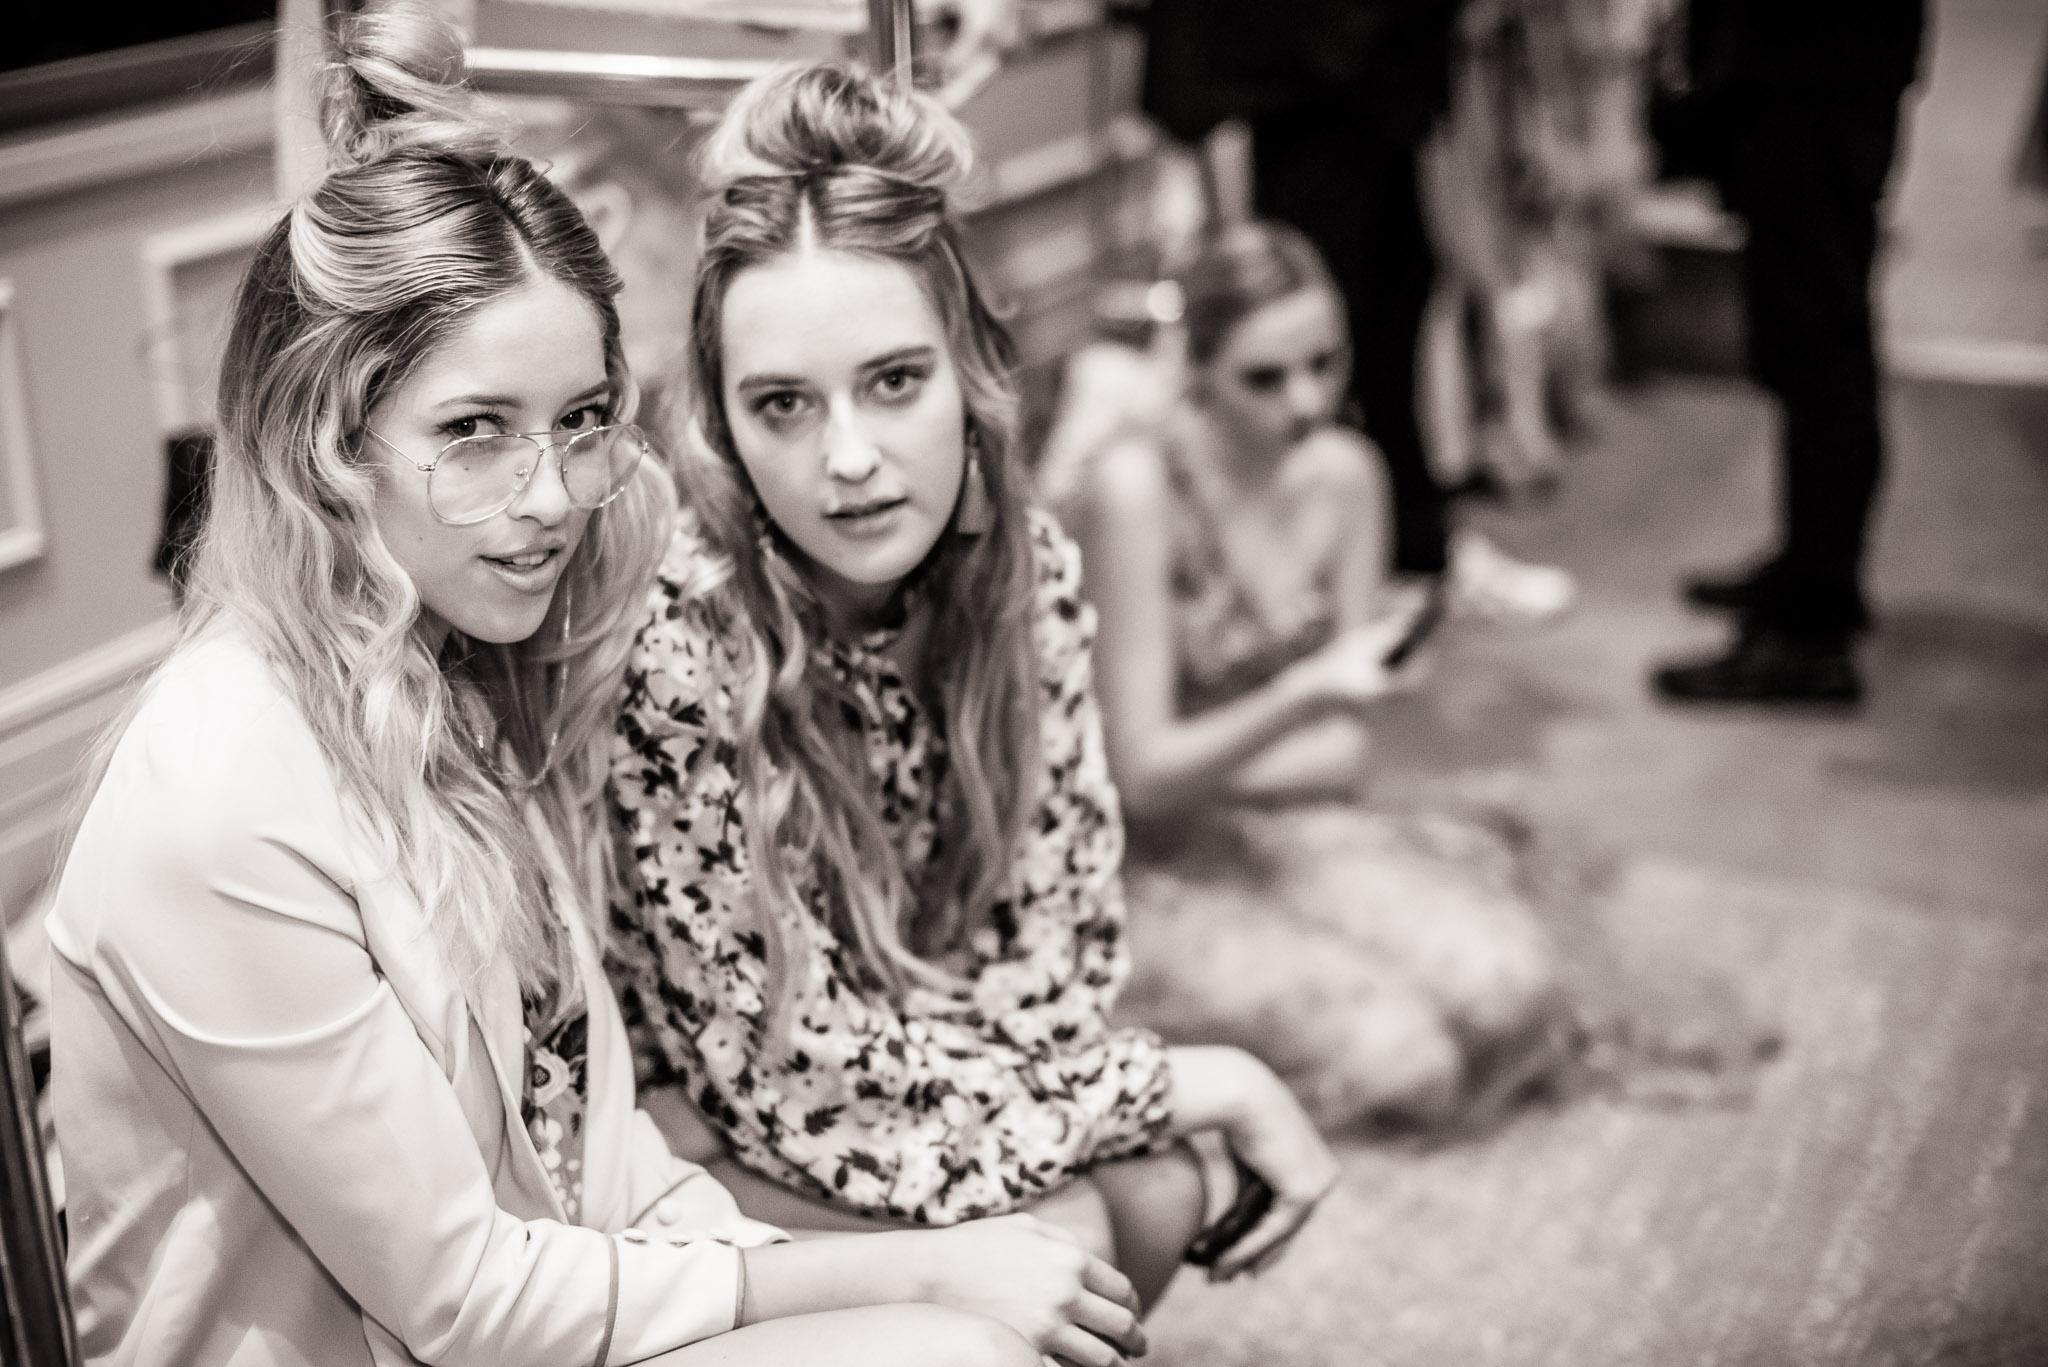 Backstage at Los Angeles Fashion Week, October 5th, 2017